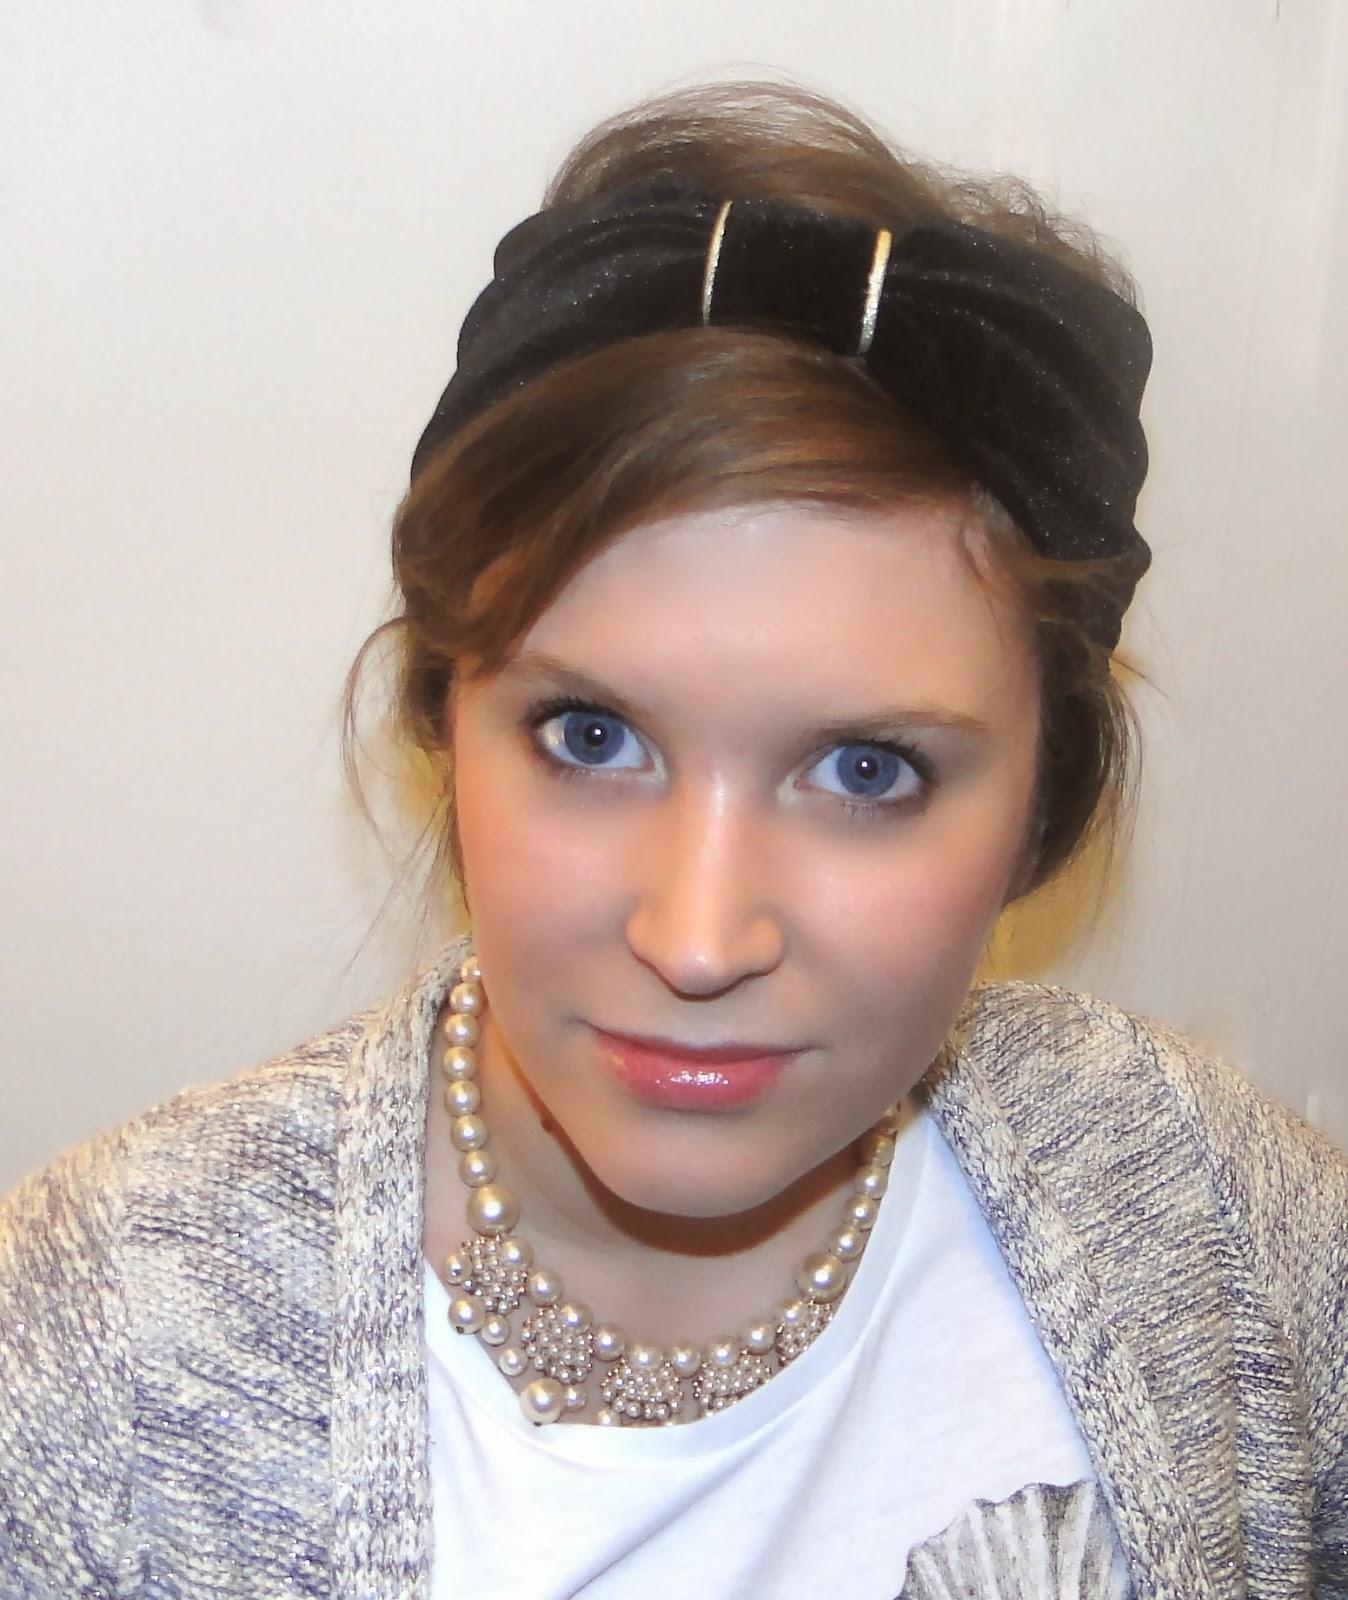 Headband, Bijoux de tête, Fashion, Adeli Paris, Made in France, Maud Factory